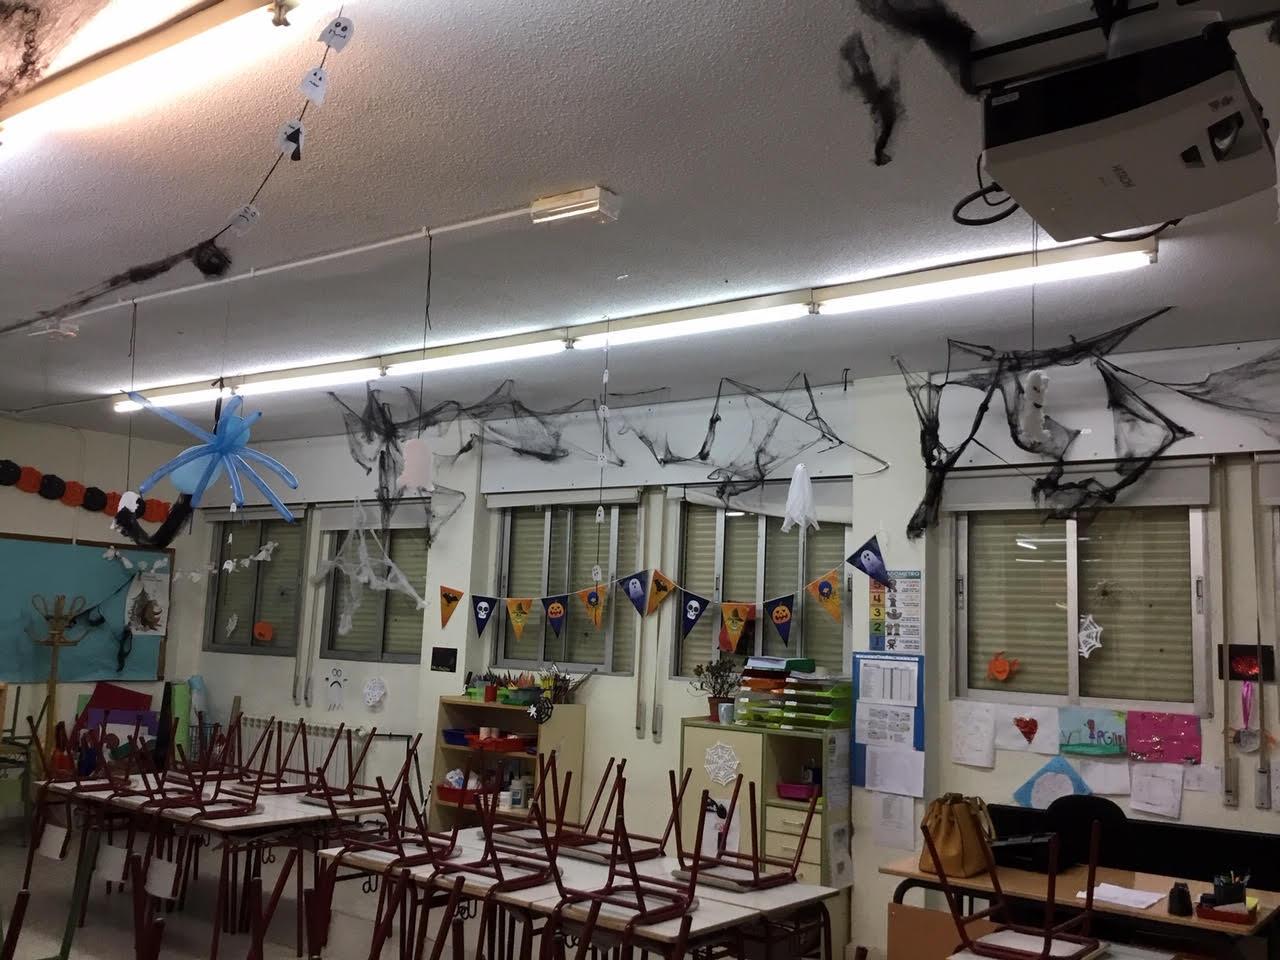 2018_10_31_Cuarto B disfruta en Halloween_CEIP FDLR_Las Rozas 9